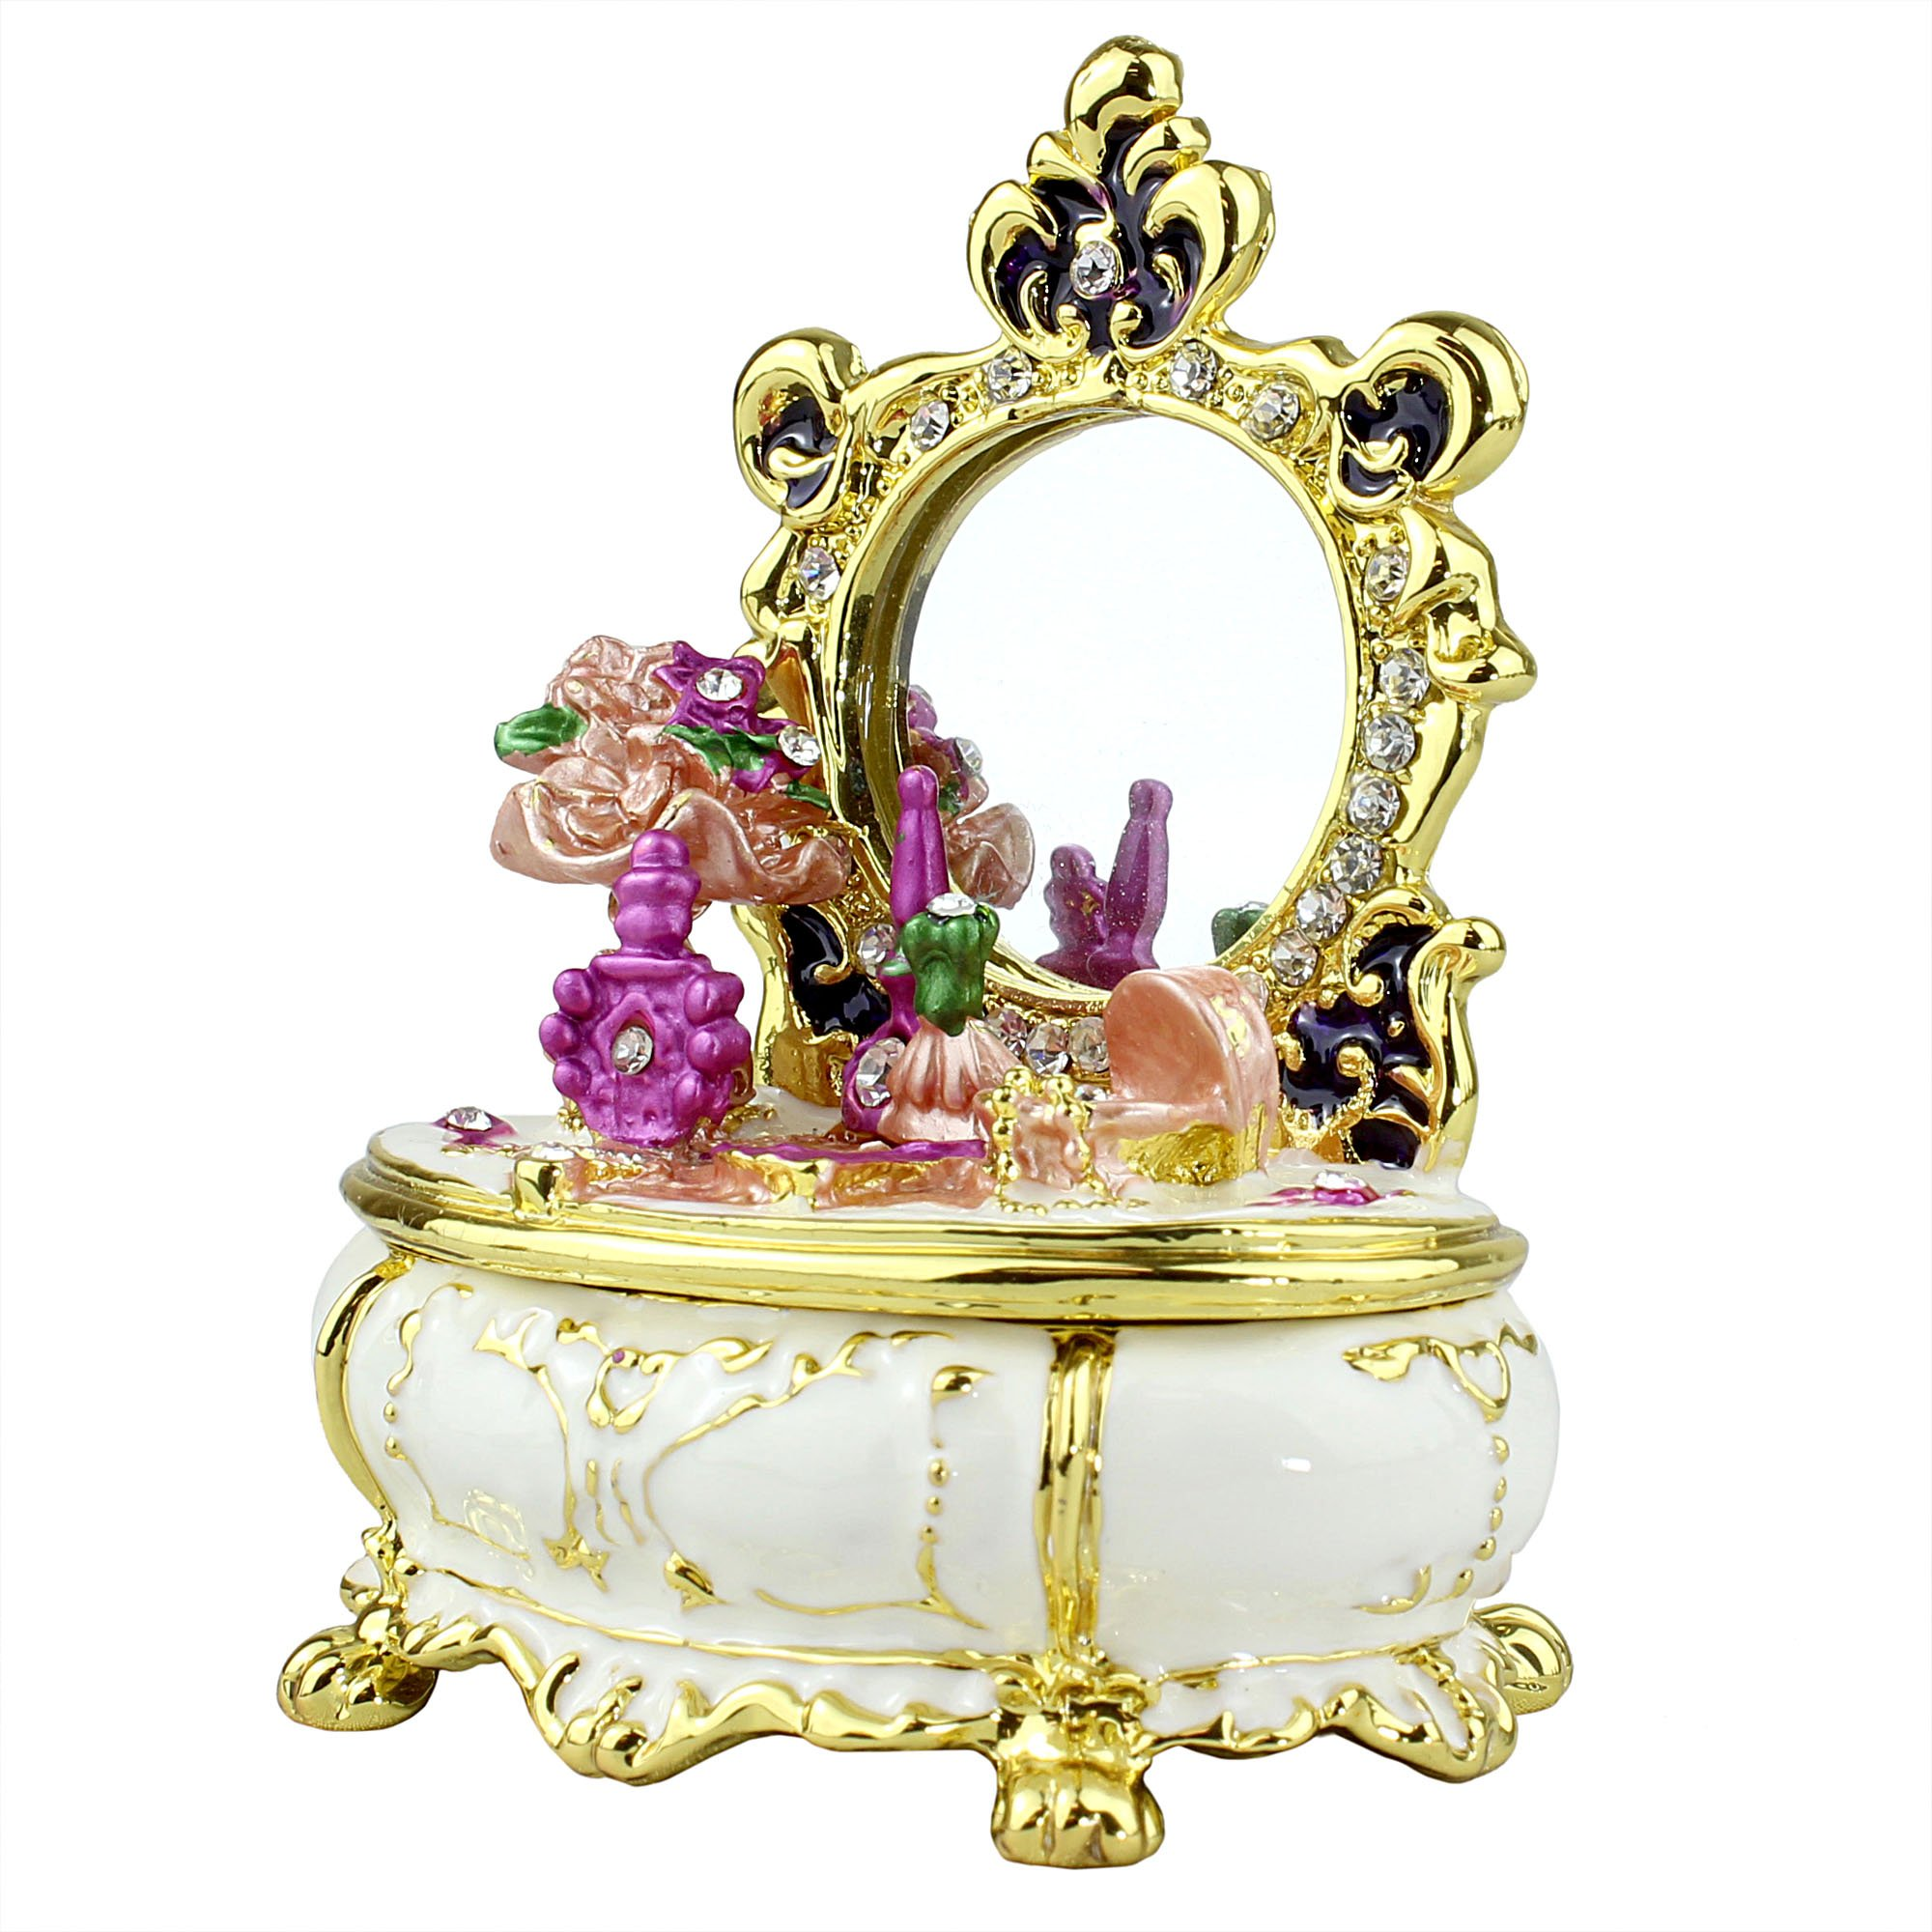 Image of Lovely Ornate Victorian Dresser Trinket Box